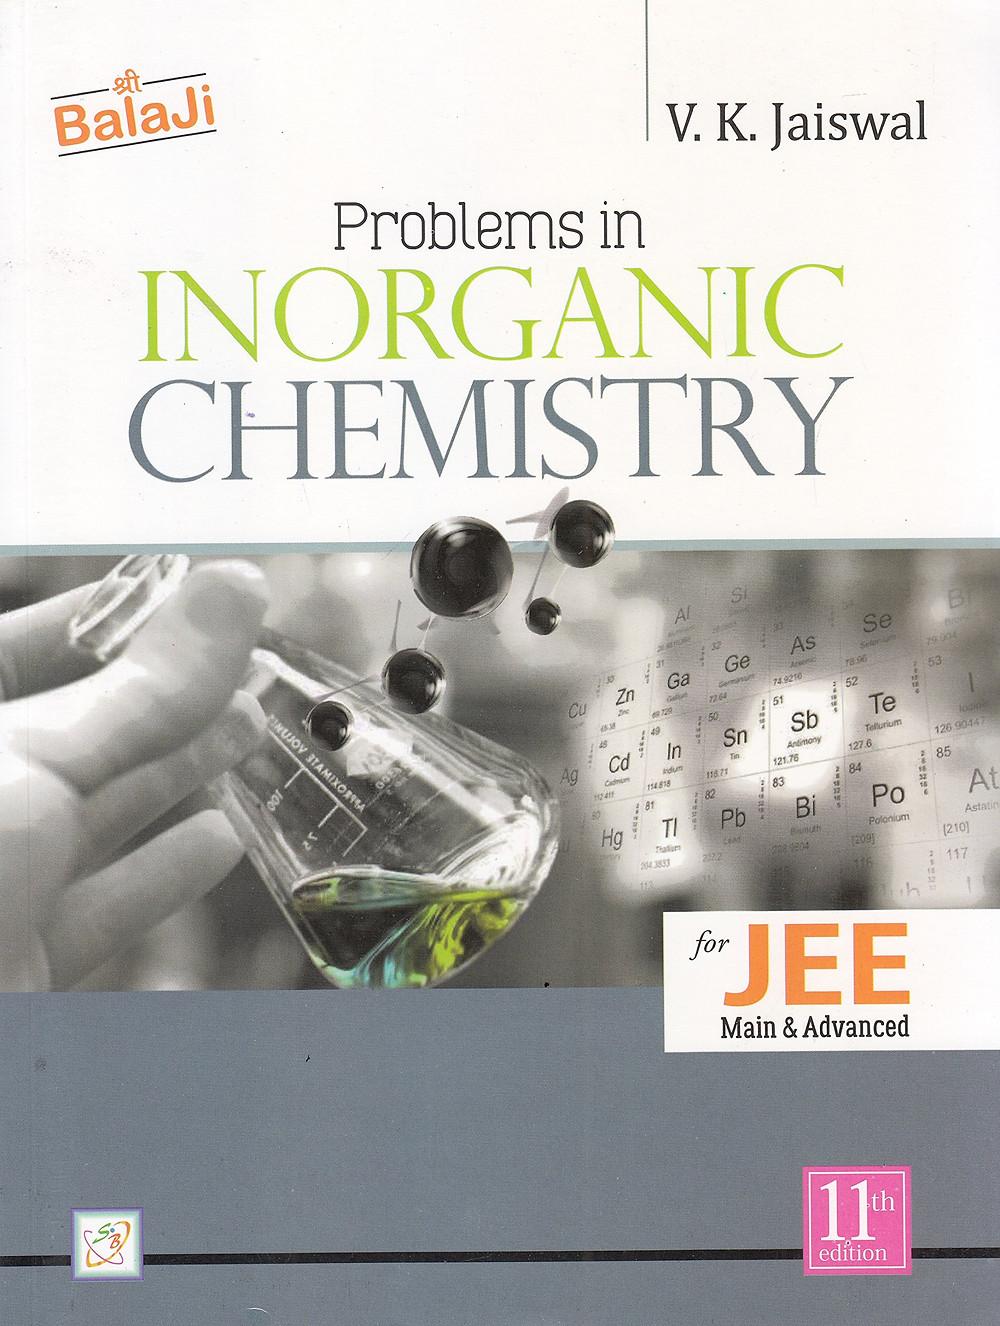 vk jaiswal inorganic chemistry | vk jaiswal pdf download | Download vk jaiswal inorganic chemistry pdf download